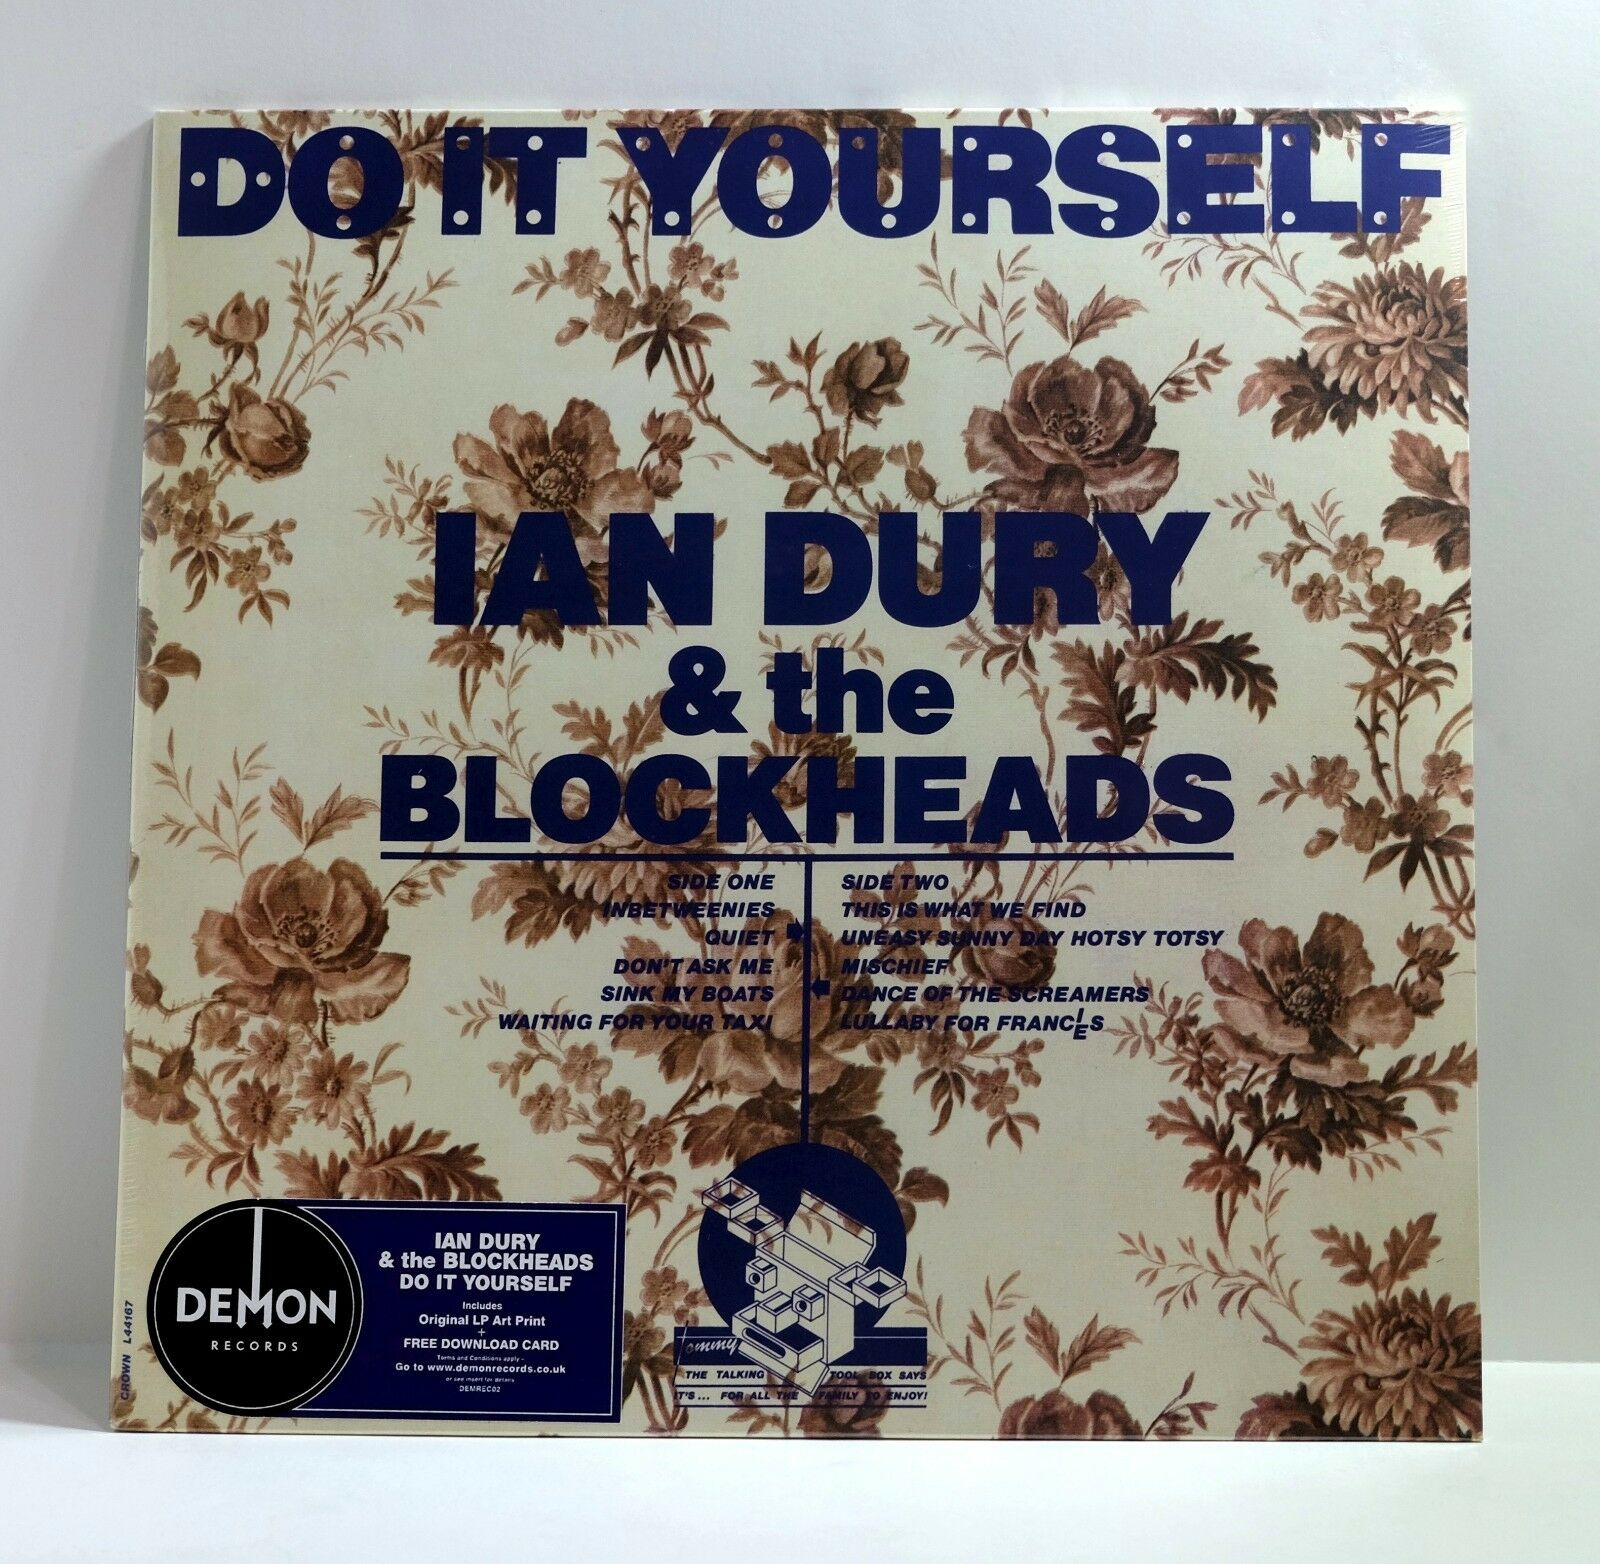 Ian dury the blockheads do it yourself vinyl lp sealed demon ian dury the blockheads do it yourself vinyl solutioingenieria Image collections